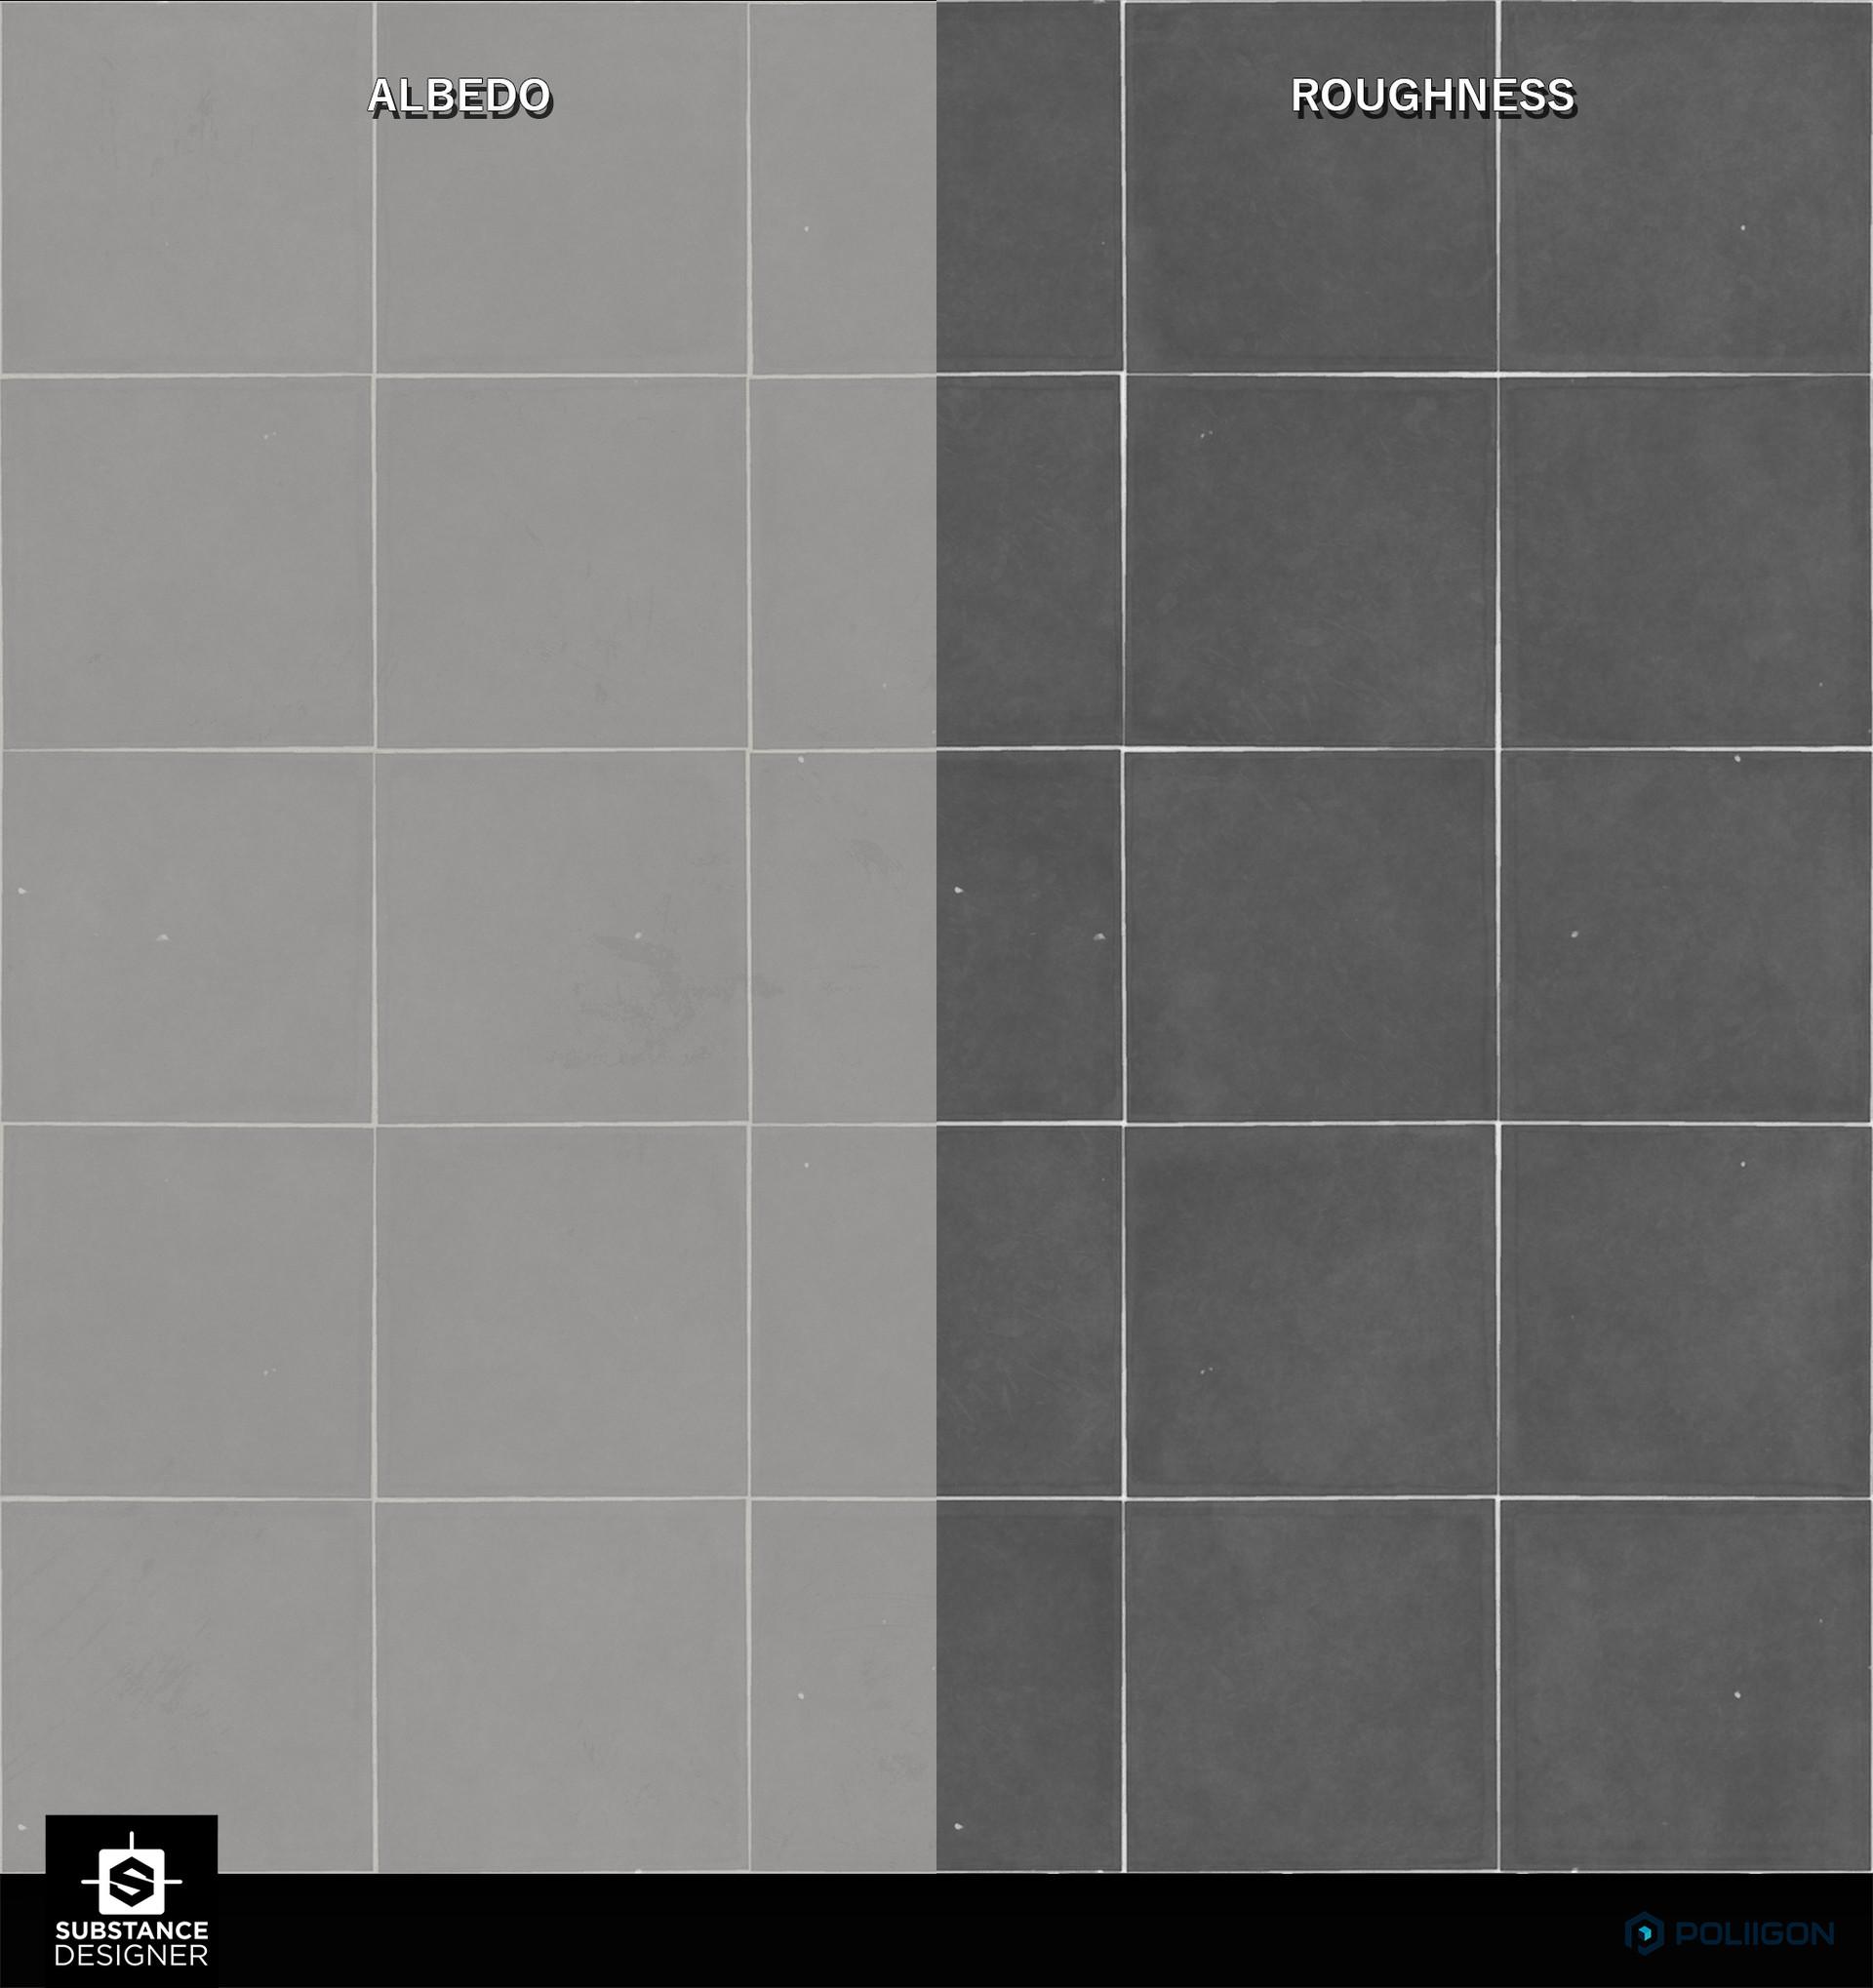 Guilherme henrique simplegray sheet